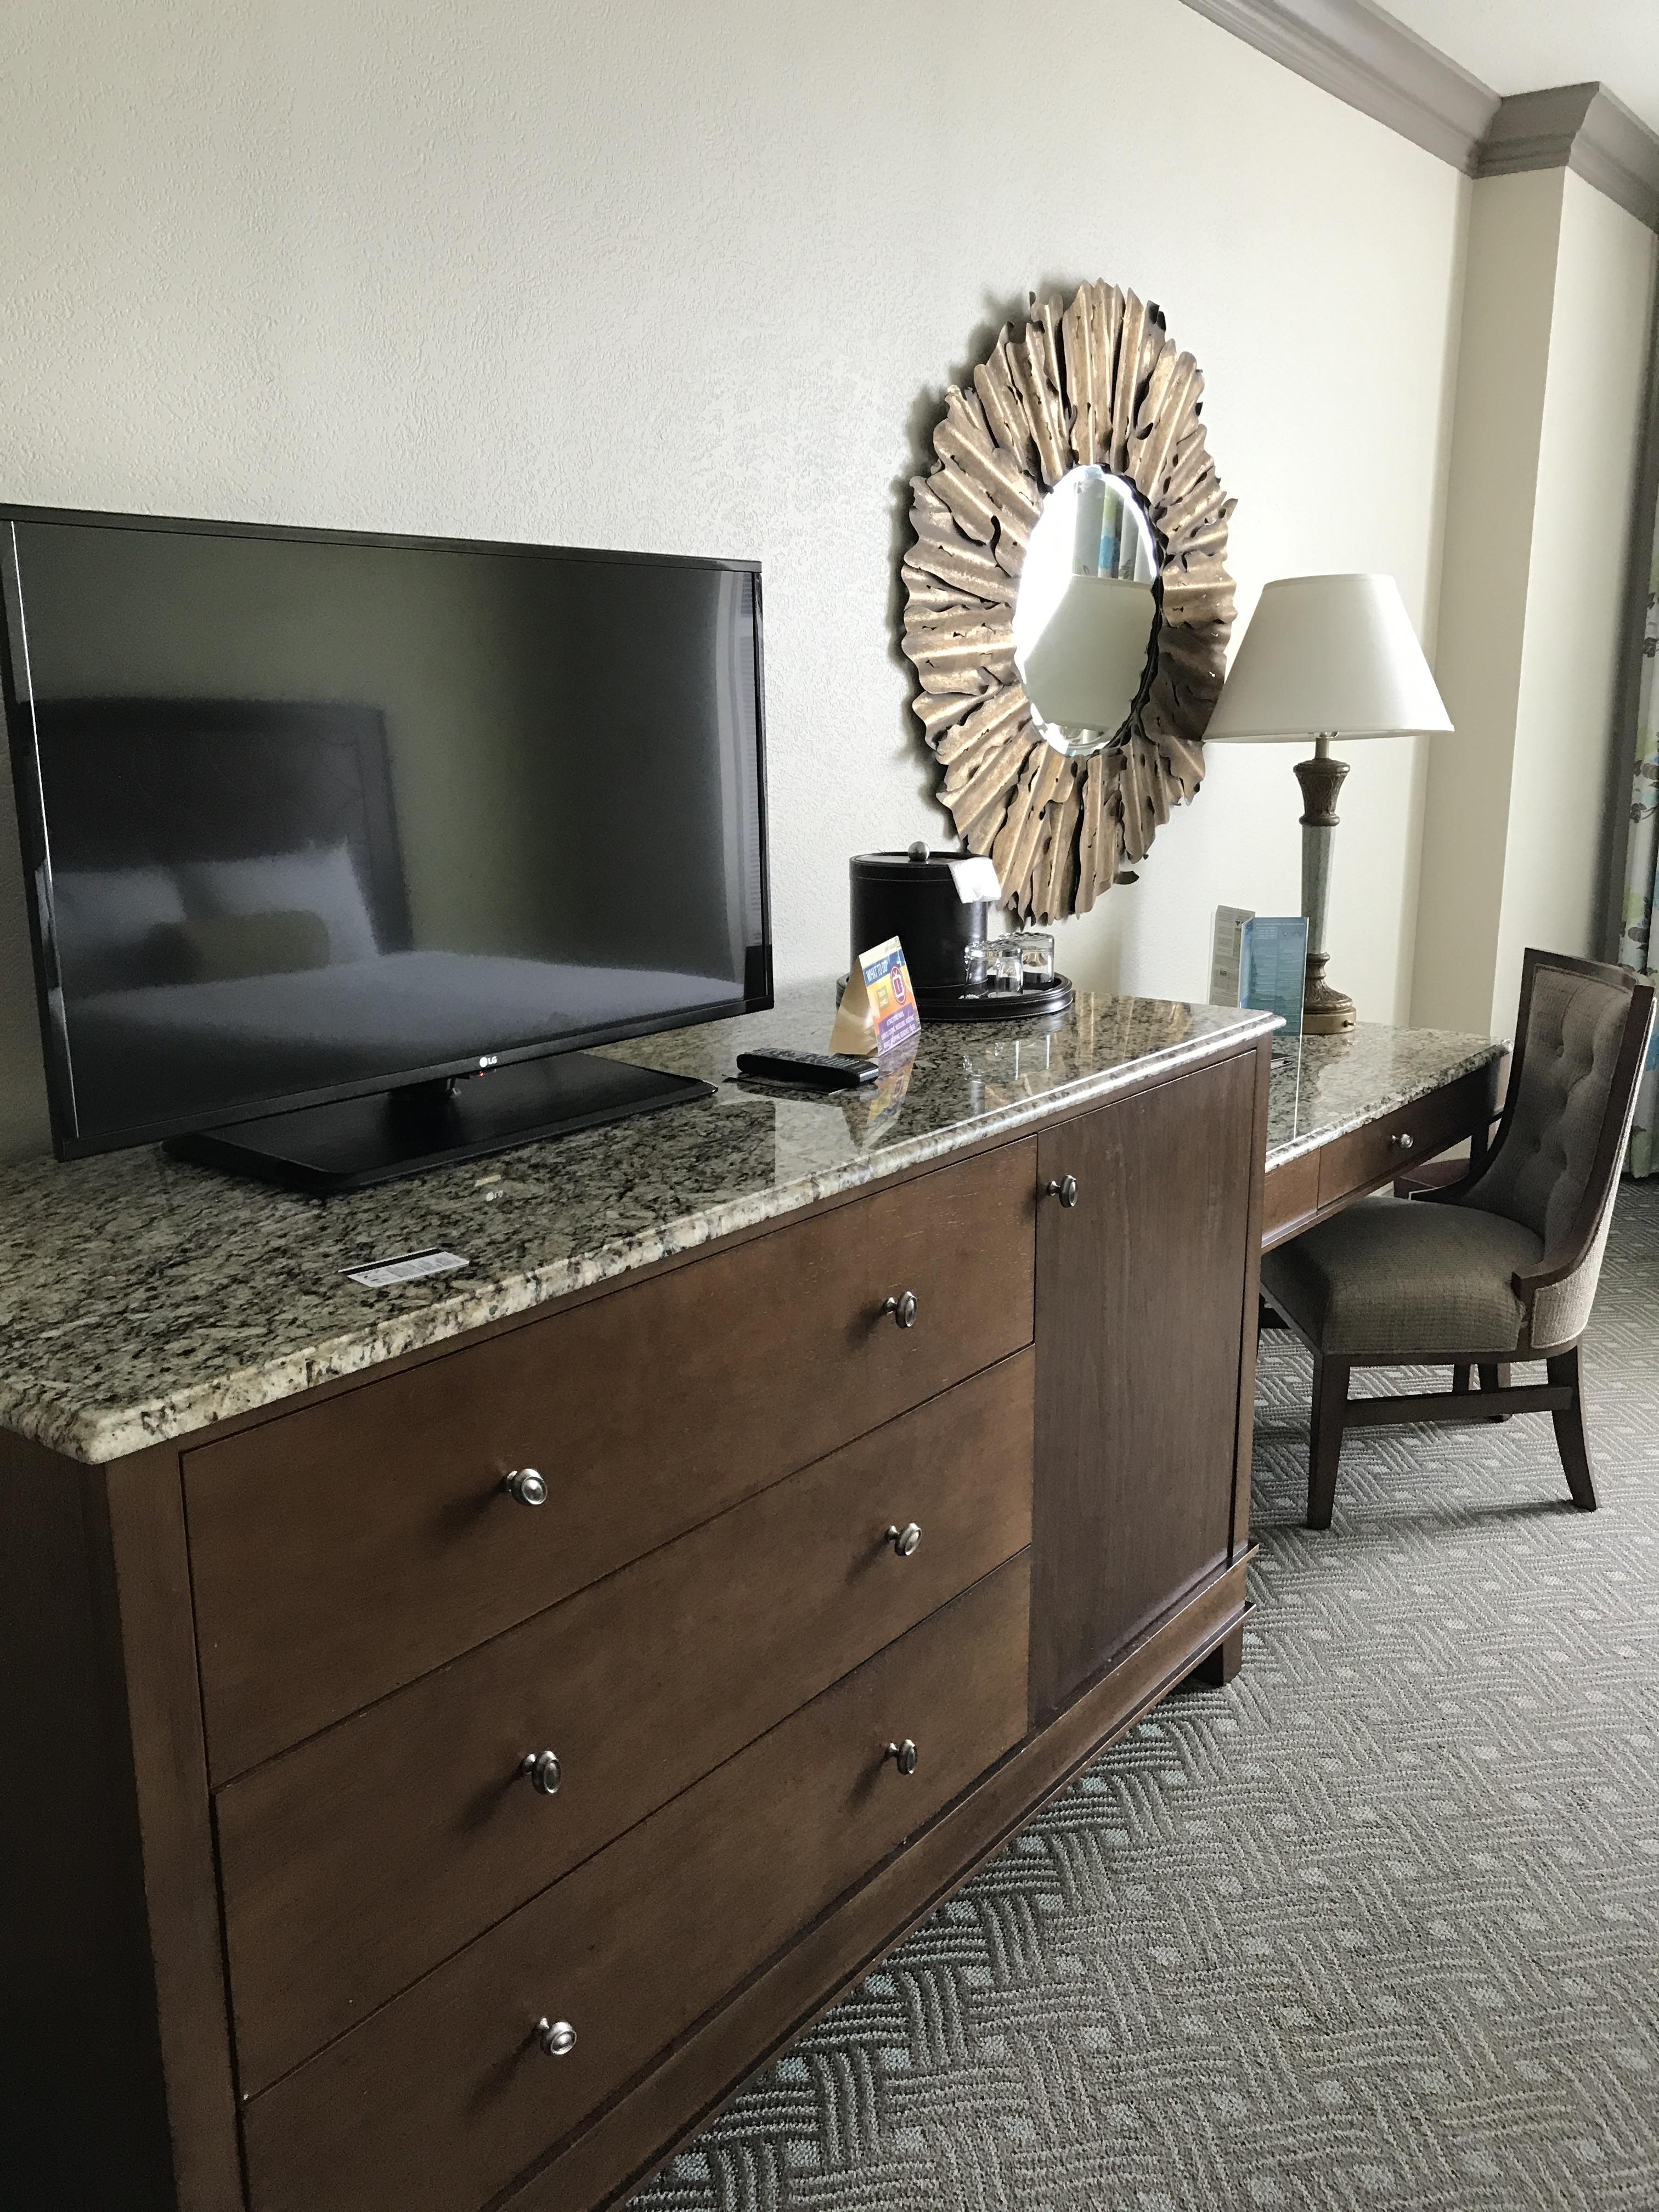 Moody Gardens Hotel & Spa Part I - DA\' STYLISH FOODIE